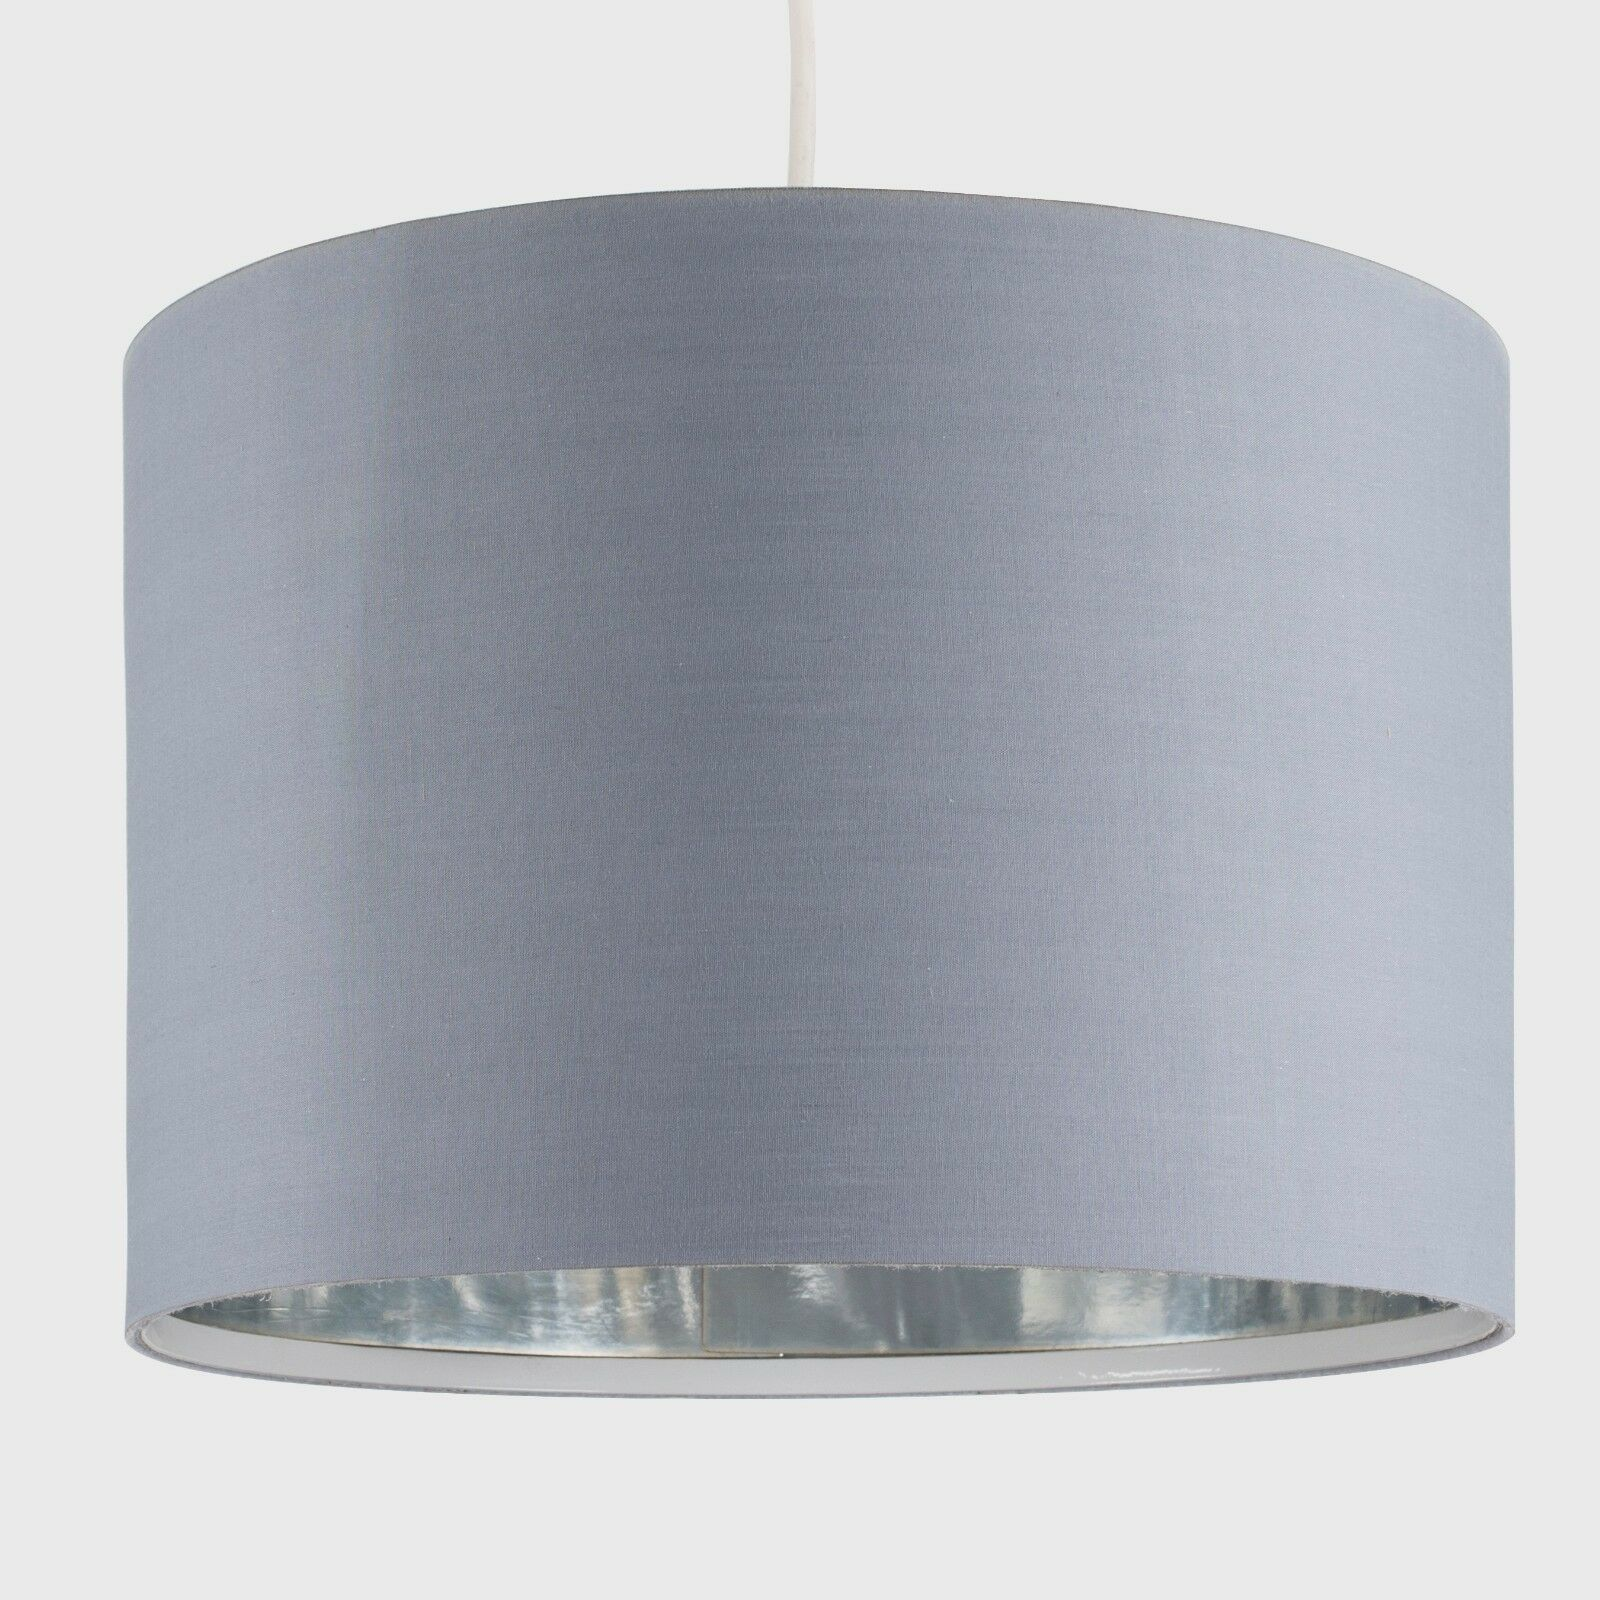 Tela-moderna-algodon-facil-ajuste-Techo-Colgante-Pantalla-De-Mesa-tonos-de-luz-de-tambor miniatura 121